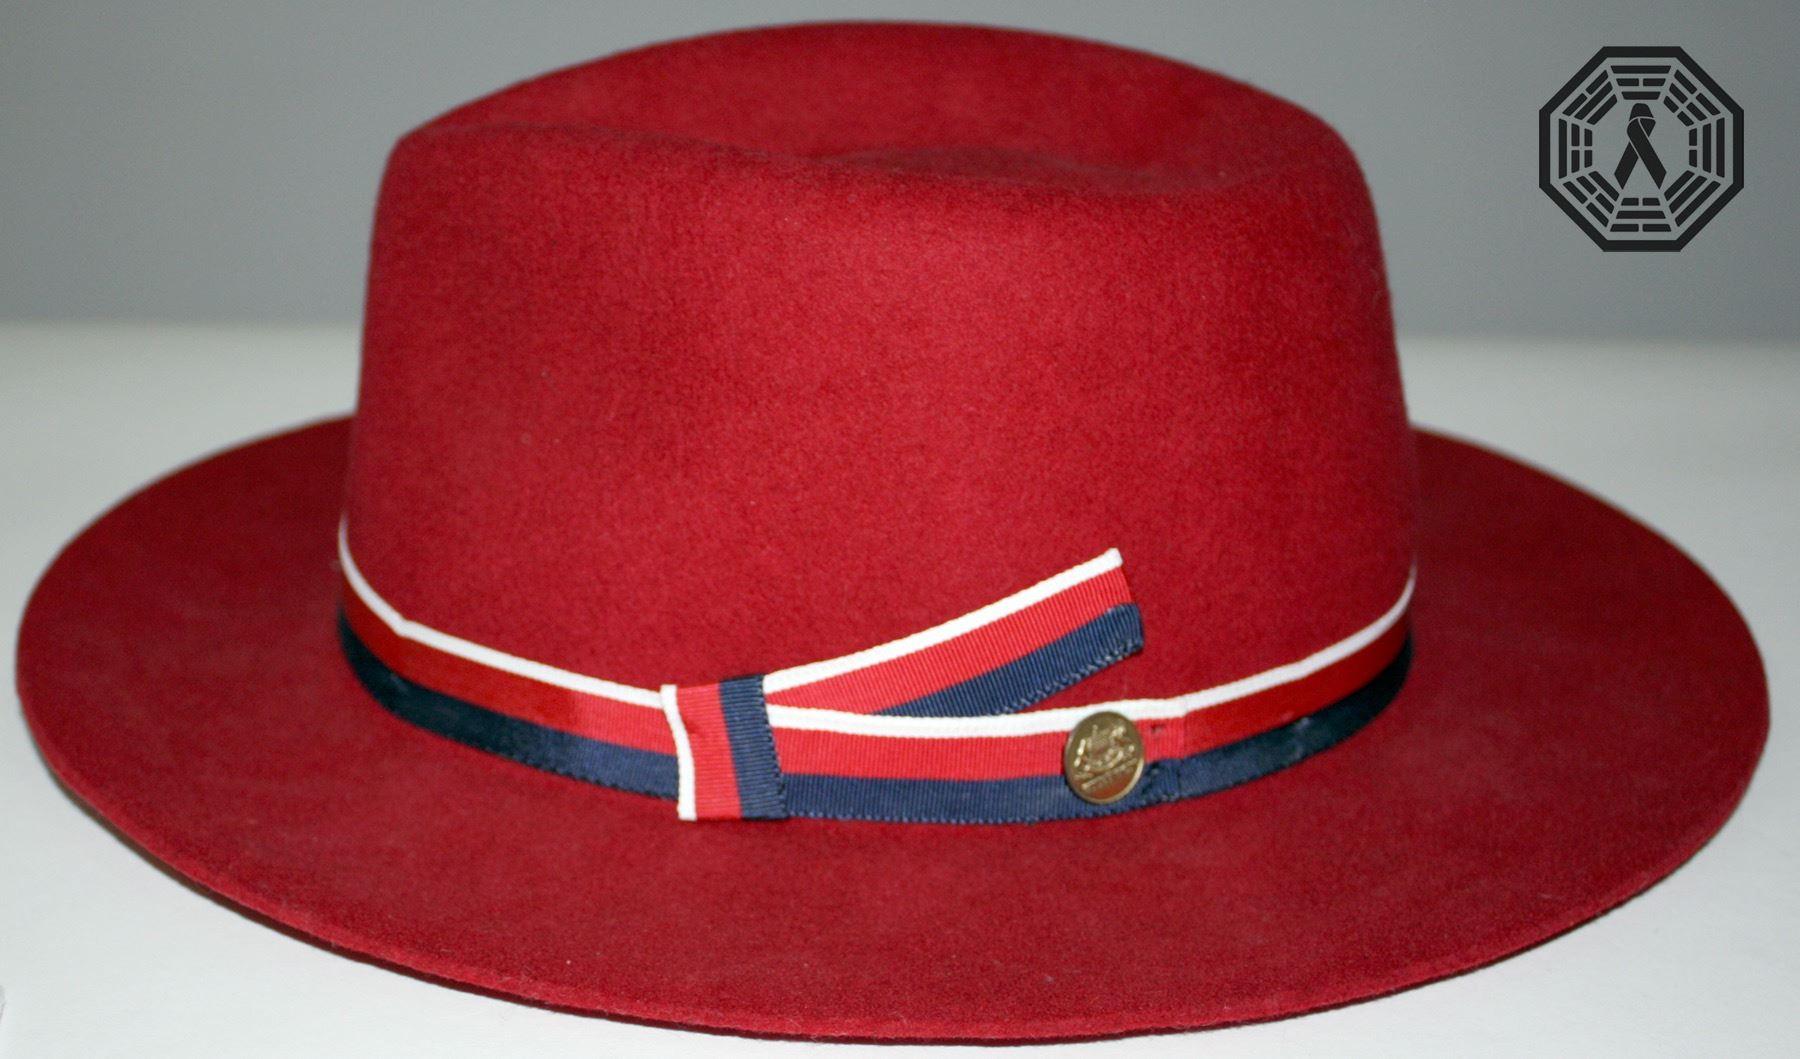 efc5d4b4 Image 1 : Agent Carter Replica Peggy Carter Hat ...